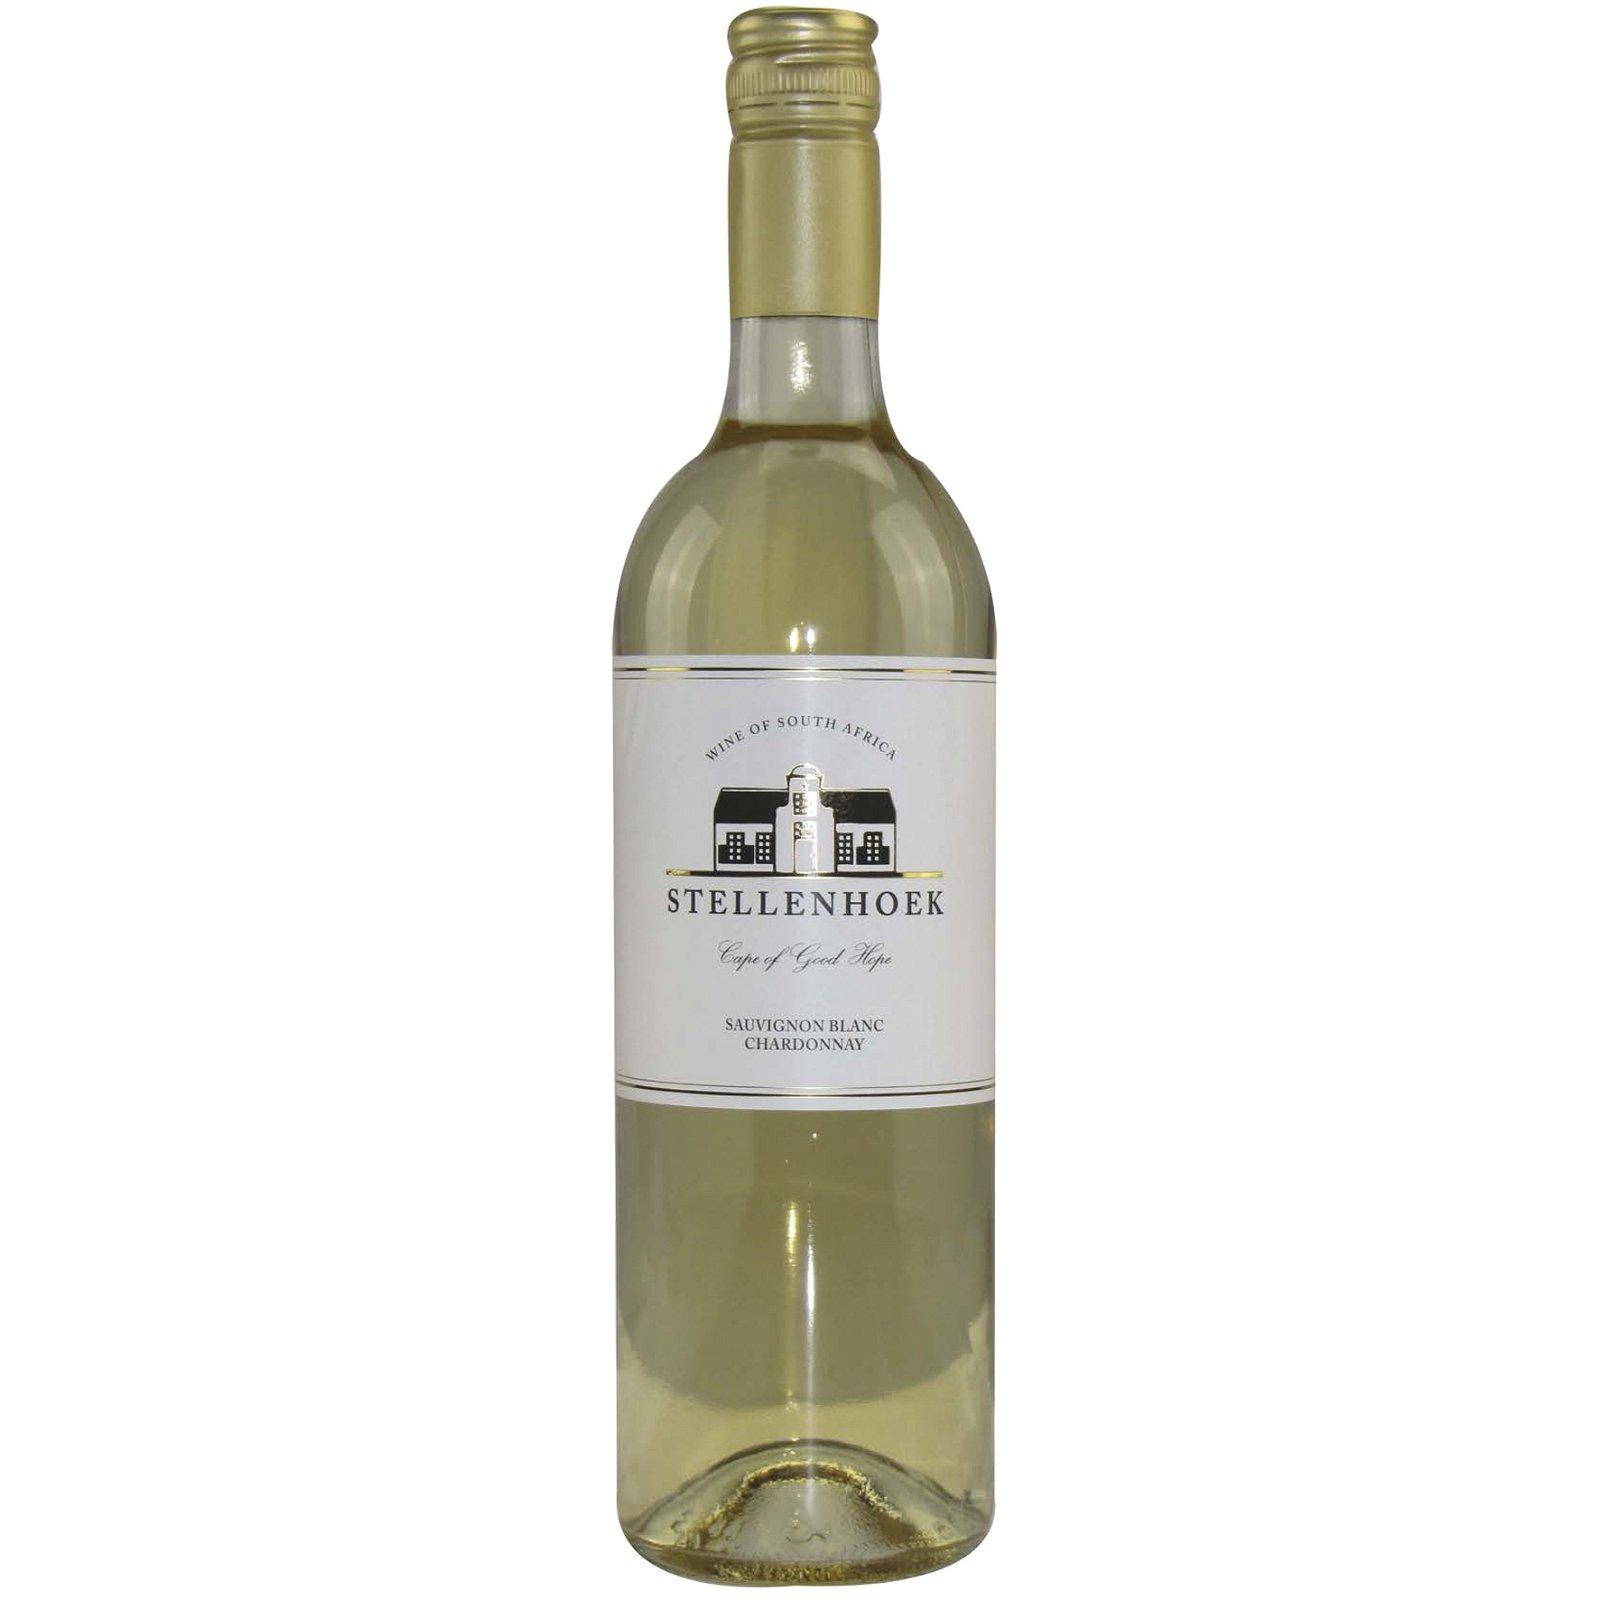 Stellenhoek Sauvignon Blanc - Chardonnay